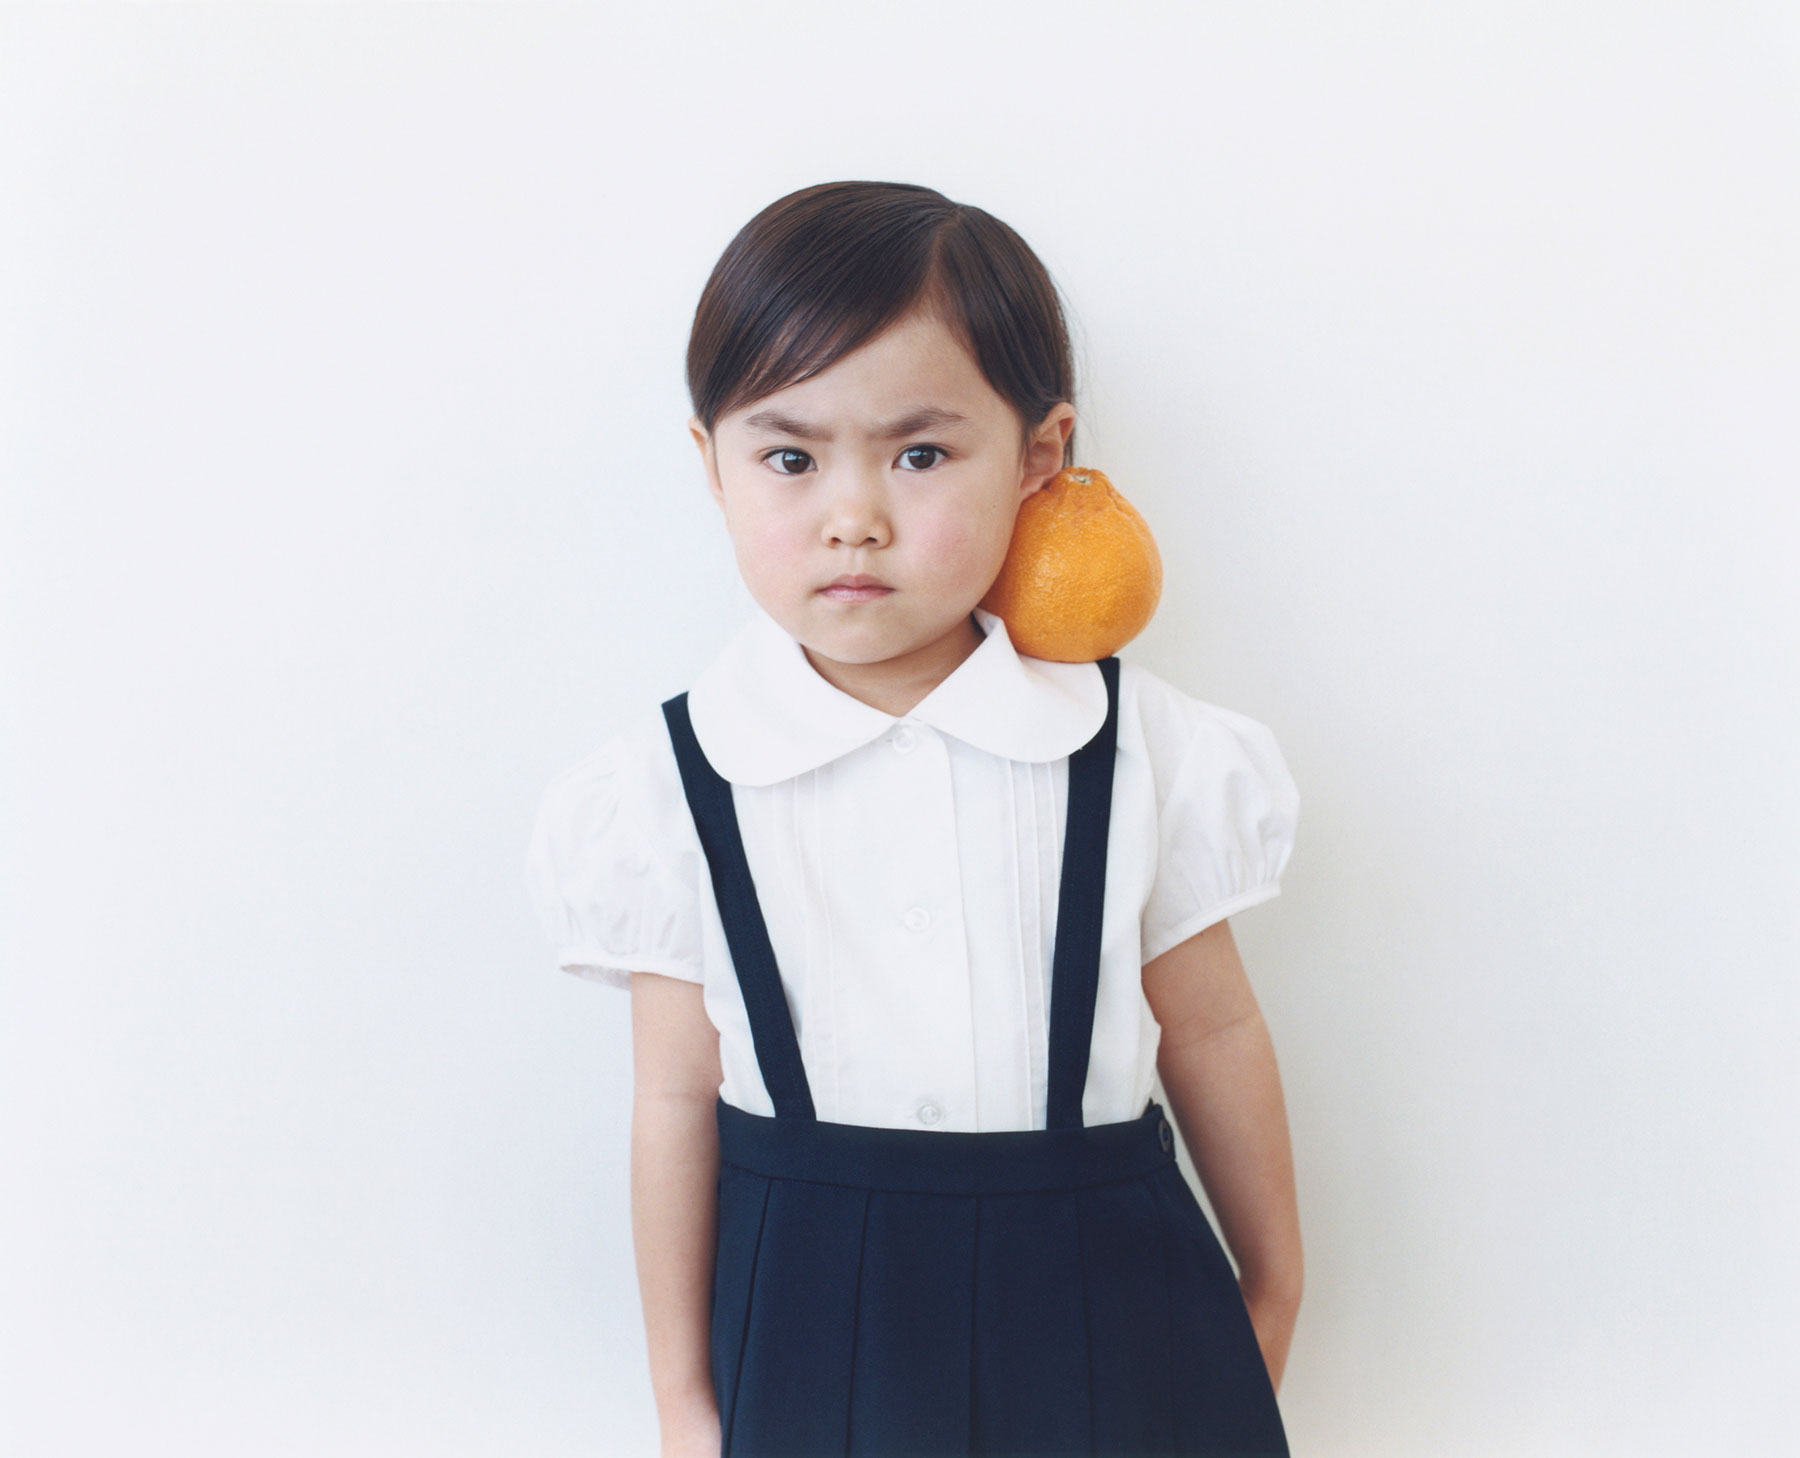 Osamu Yokonami,  1000 Children: Sumo Mandarin No. 39 , 2010-2013  Digital pigment print, 895 x 1105 mm (approx. 34.25 x 43.5 in), edition of 5; 146 x 168 mm (approx. 5.75 x 6.6 in), edition of 10   Inquire